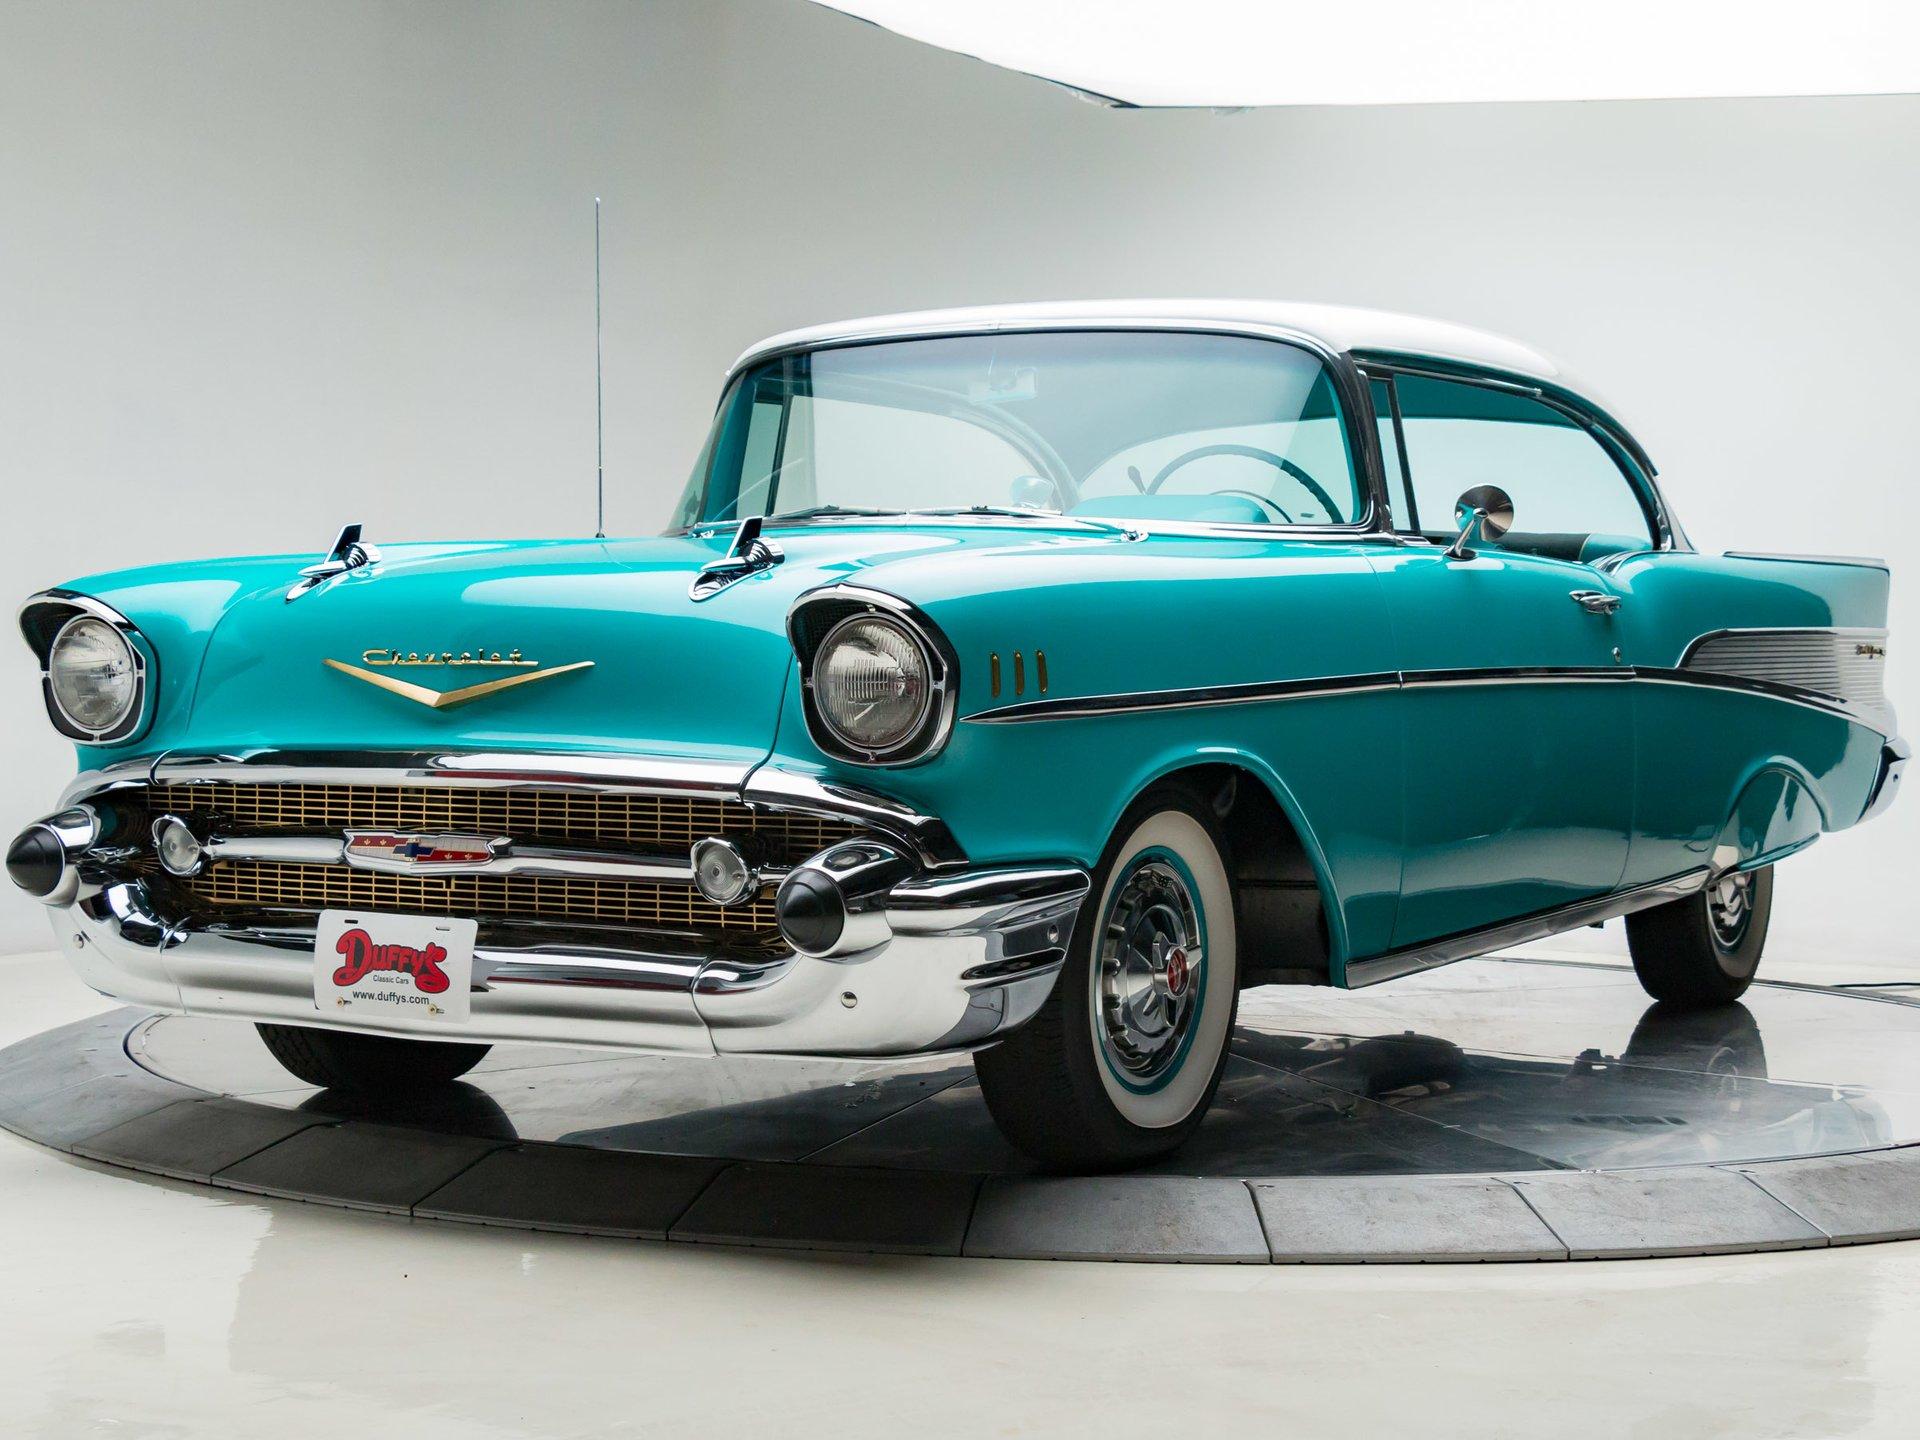 1957 Chevrolet Bel Air Duffy S Classic Cars